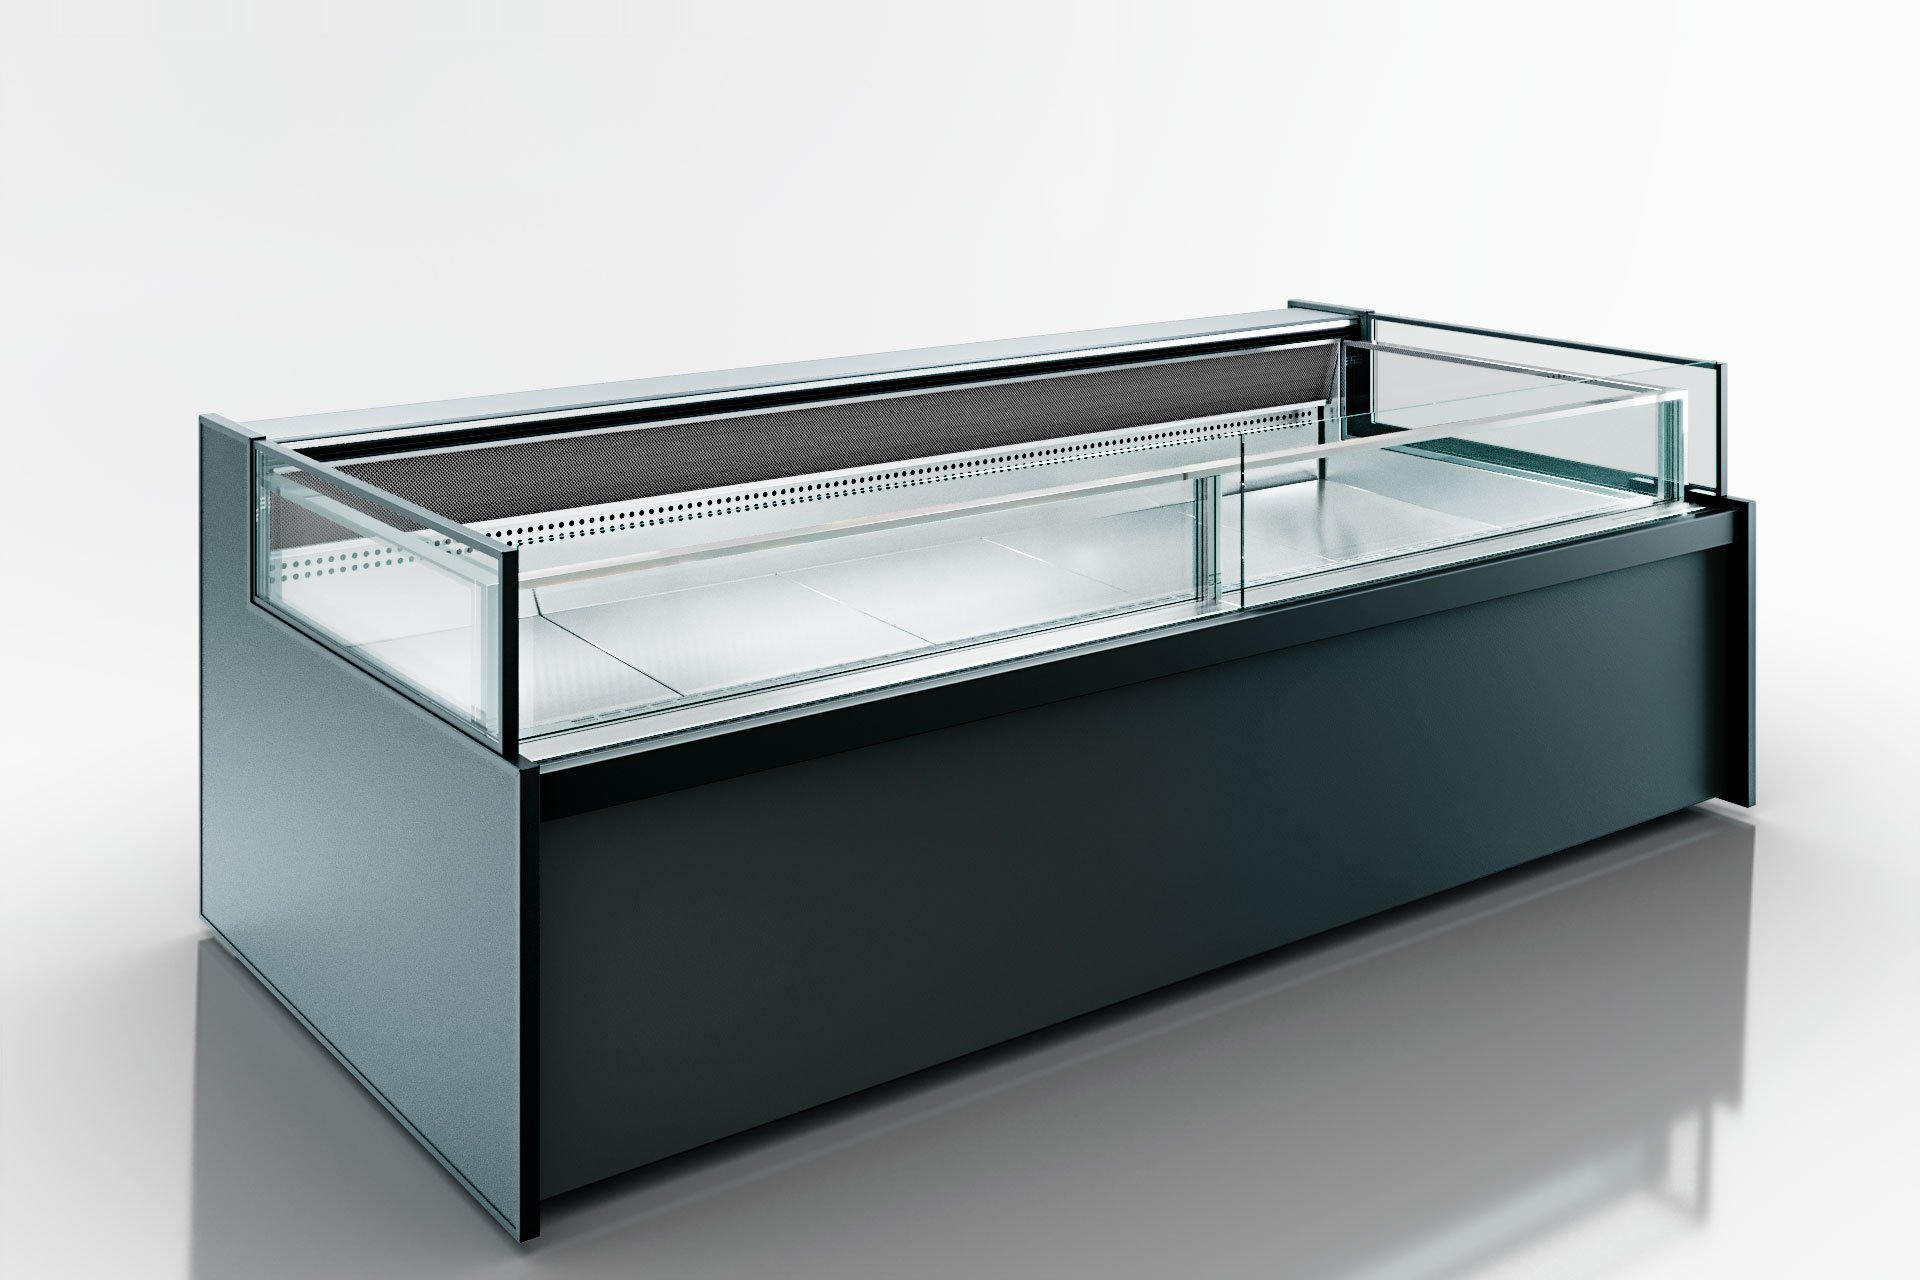 מקפיא תעשייתי MISSOURI MC 120 LT PP/PS/SELF M